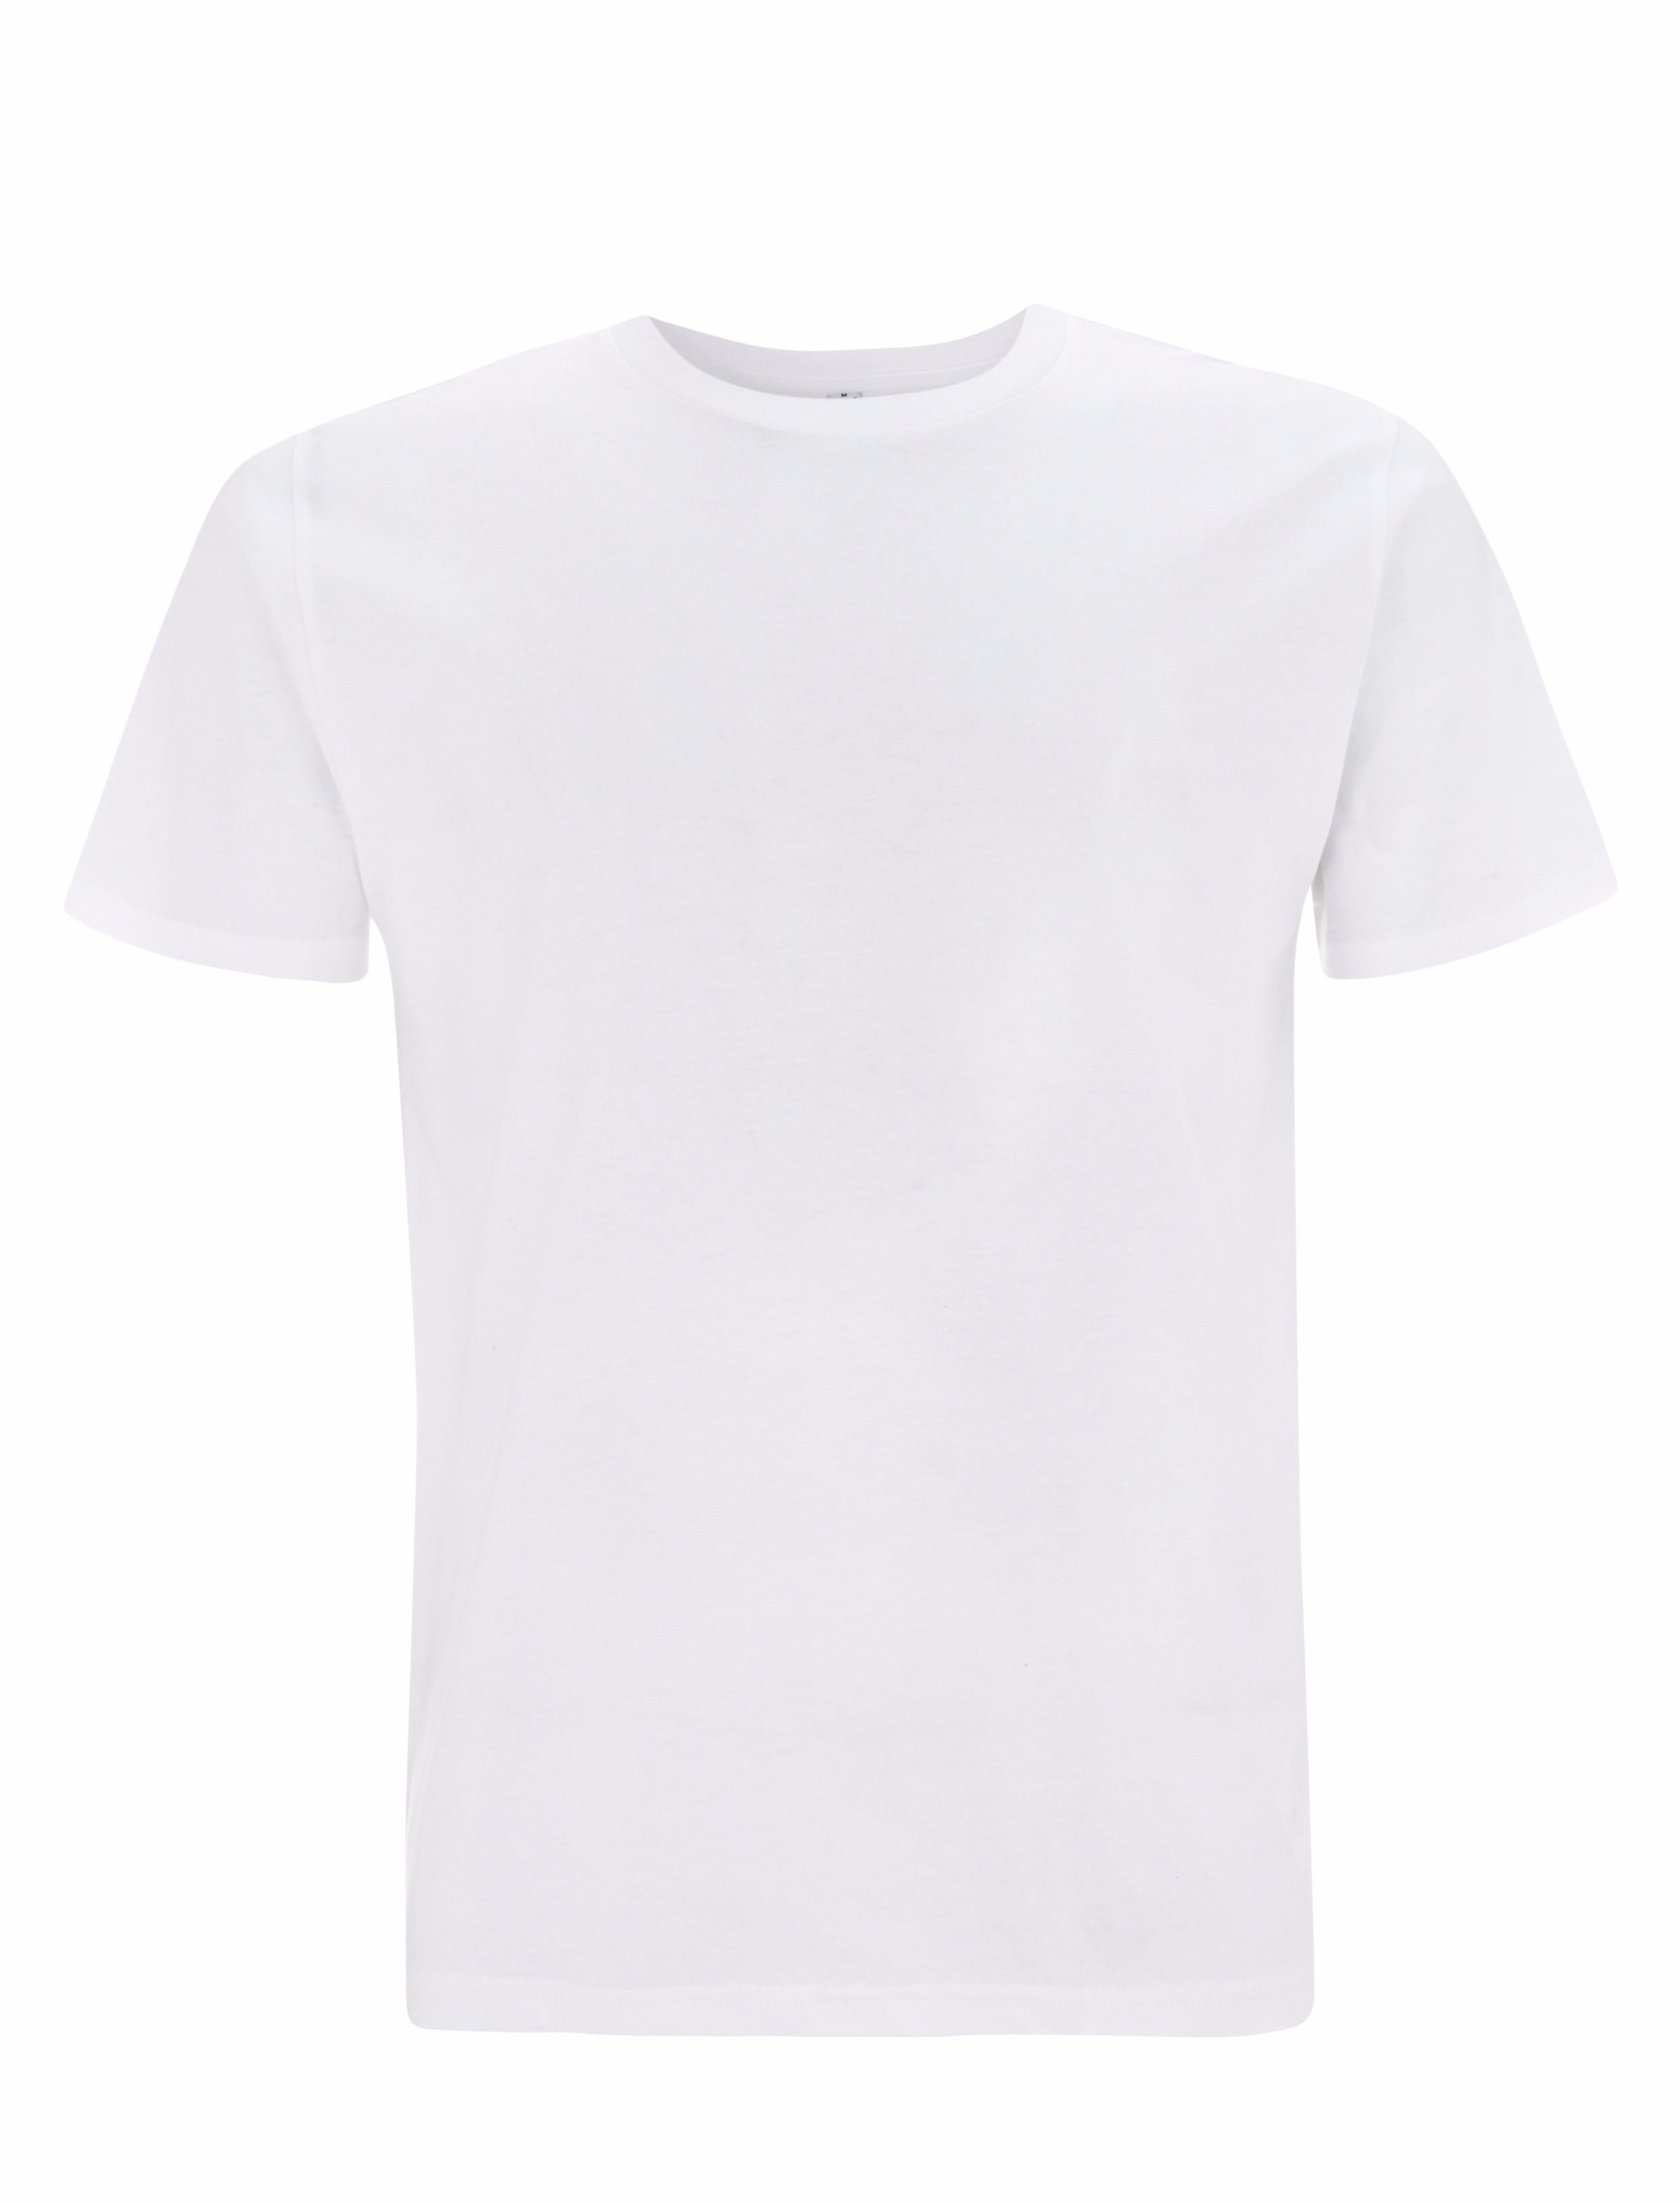 EP01 White T-Shirt